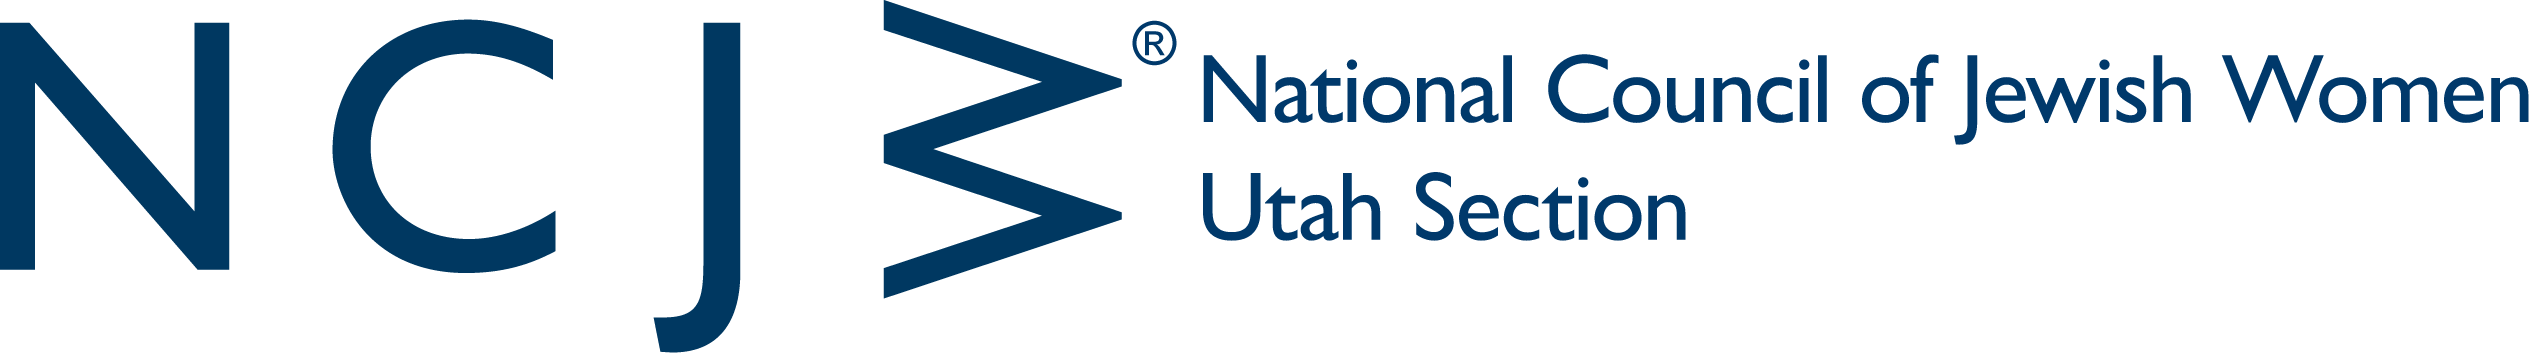 NCJW Utah Section